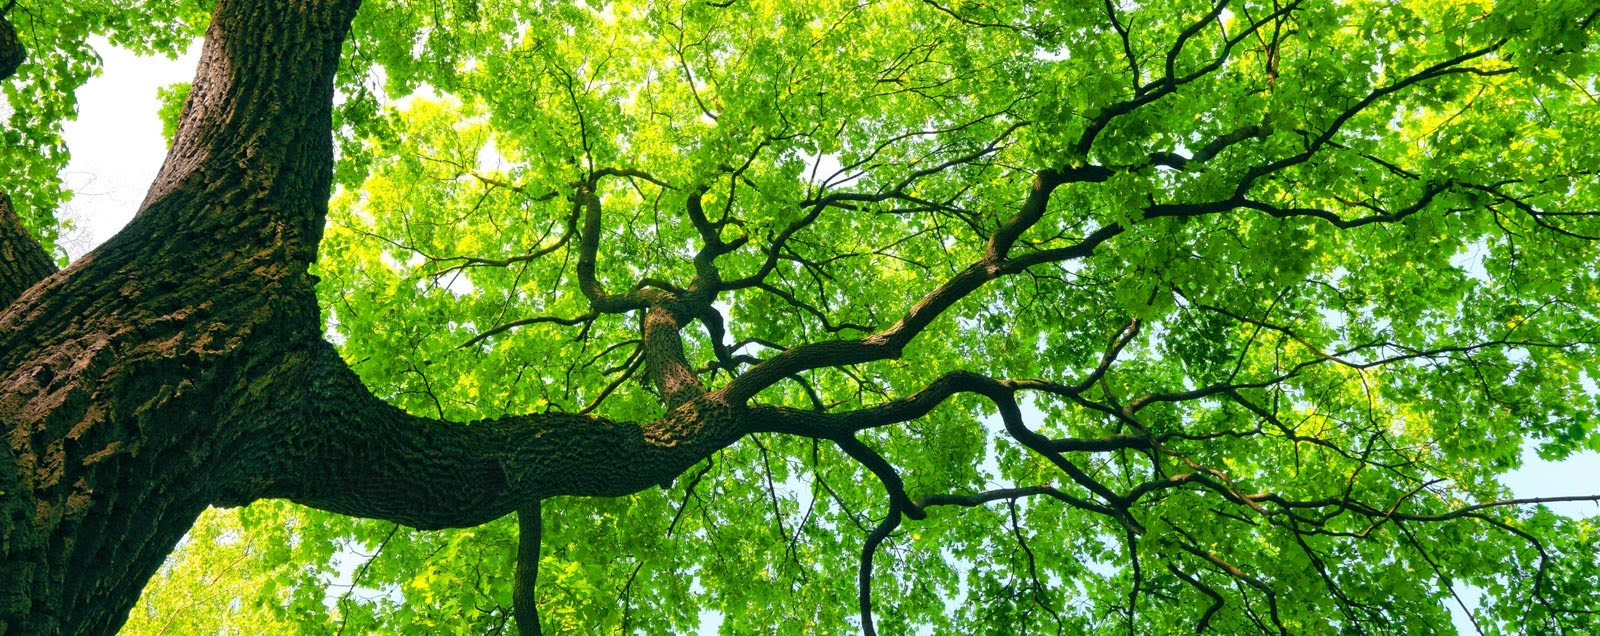 tree_care_1.jpg